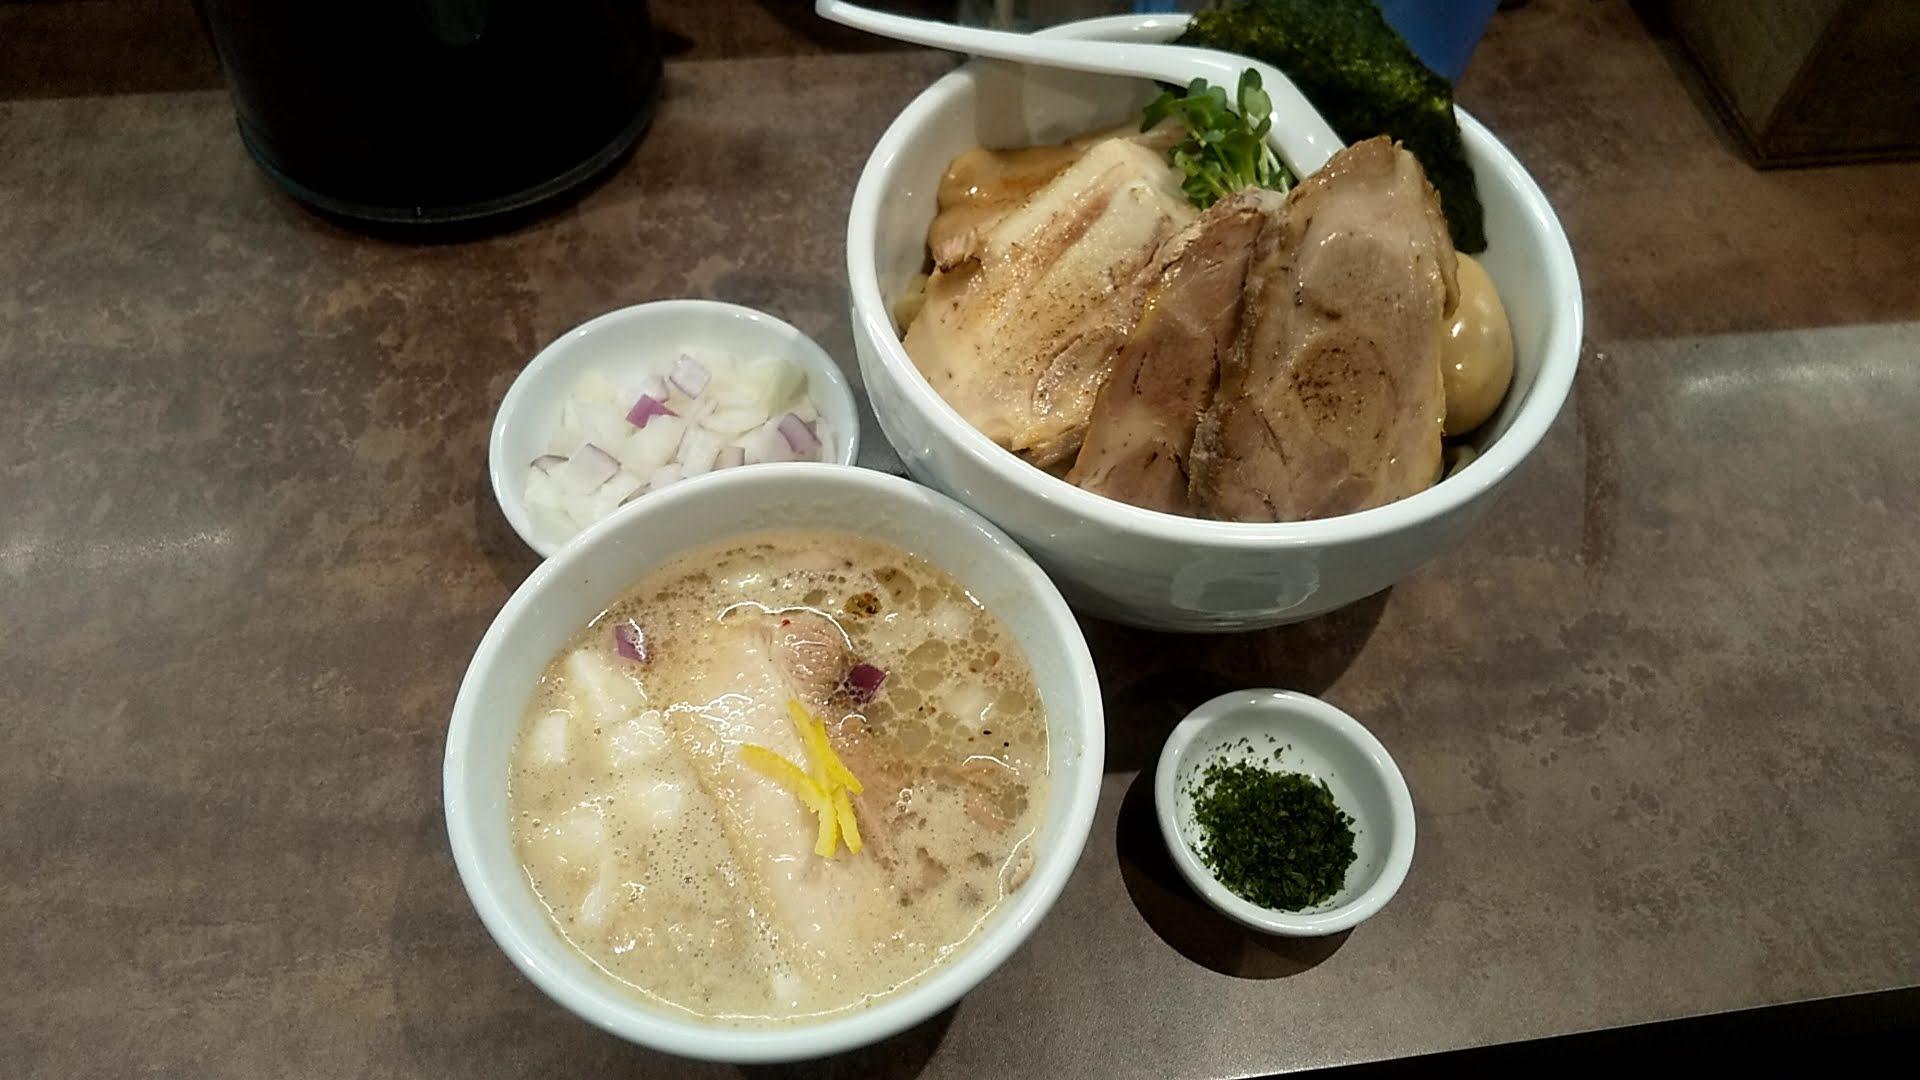 NOODLEVOICEの特製つけ麺の写真